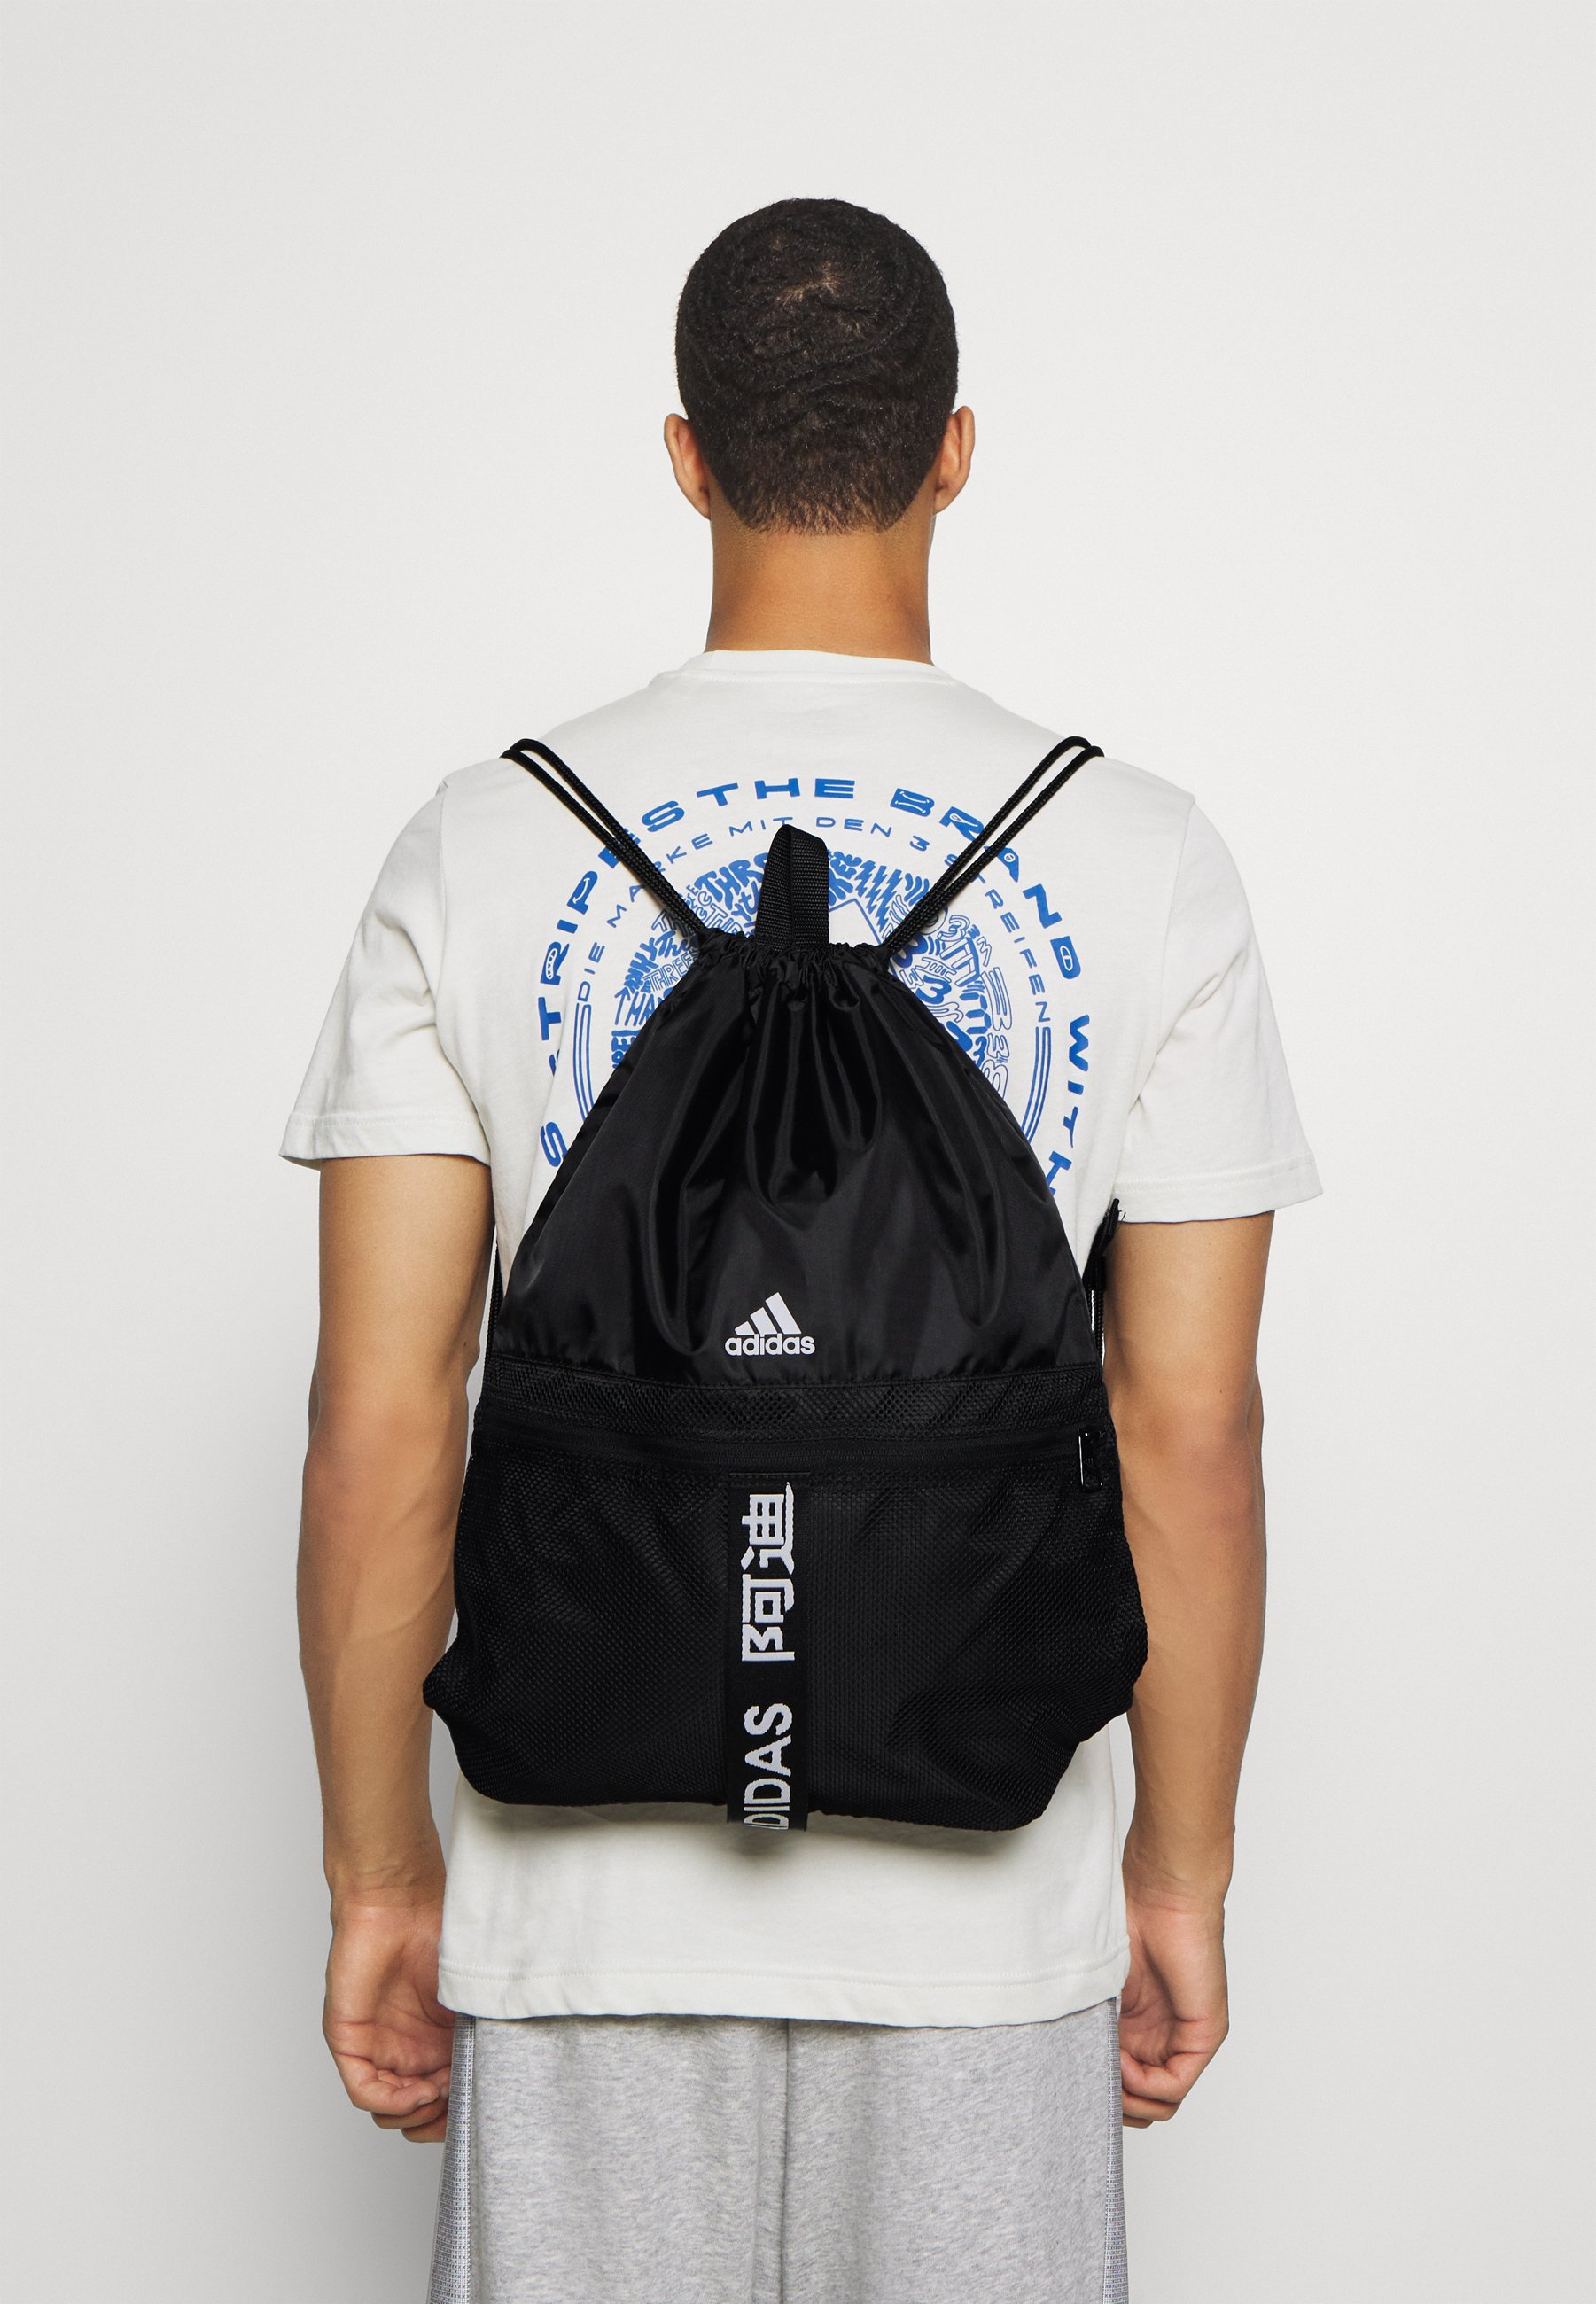 Men 3 STRIPES TRAINING SPORTS GYM SACK UNISEX - Drawstring sports bag